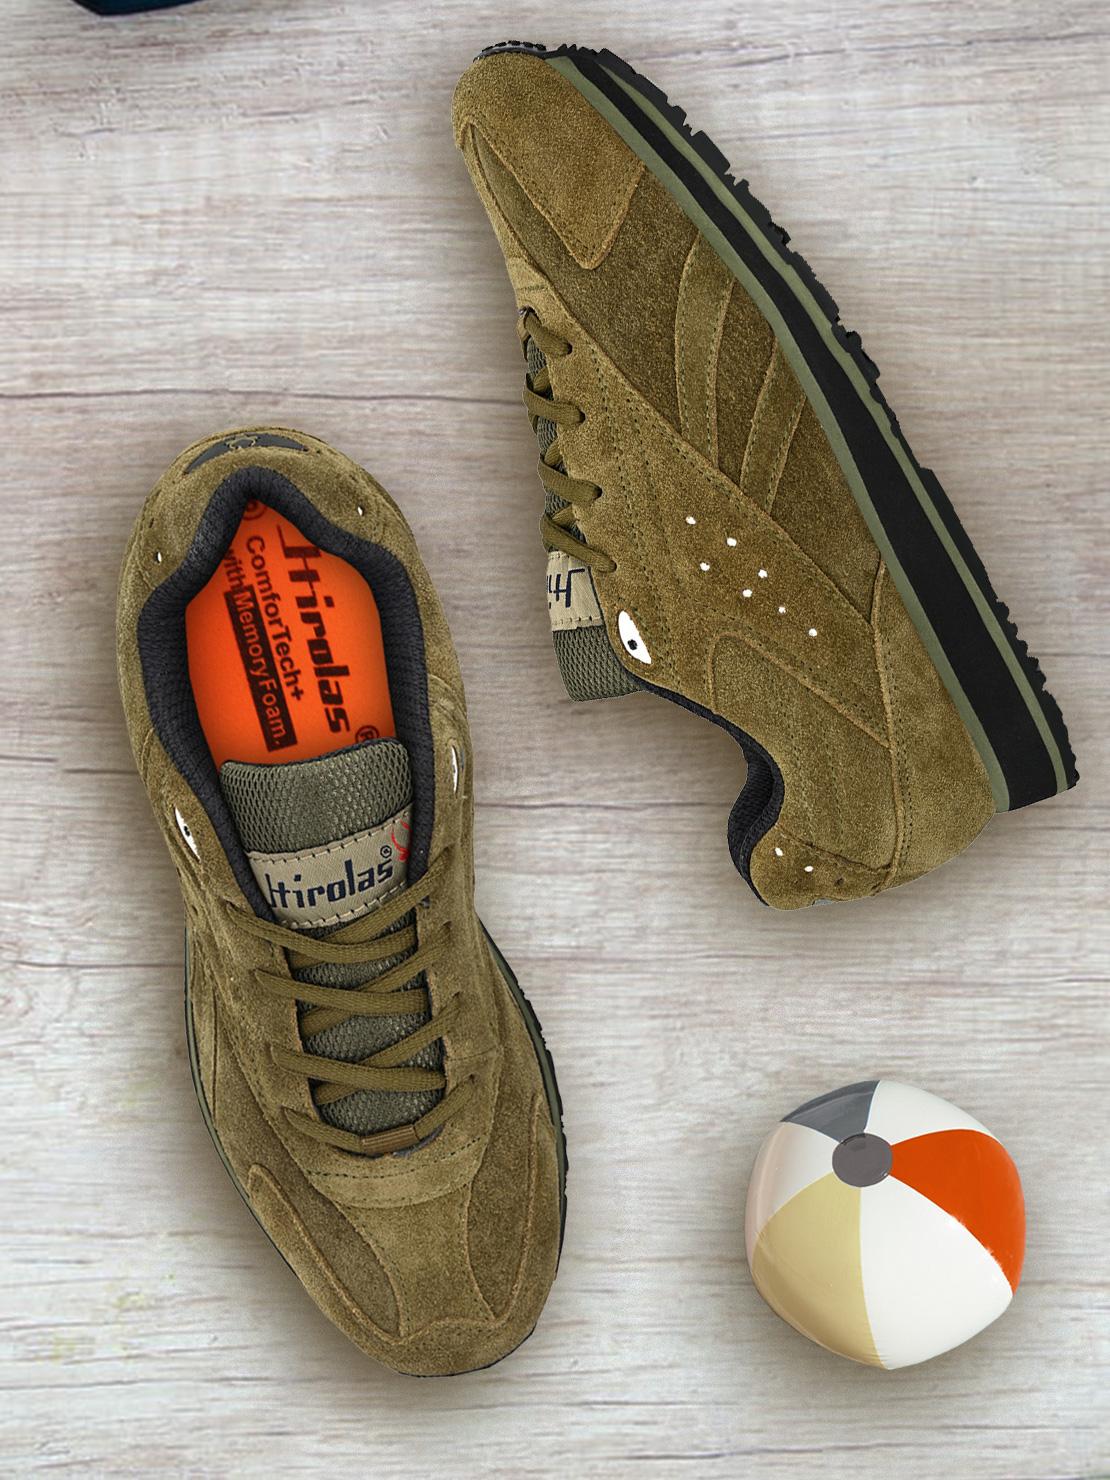 Hirolas | Hirolas® Men's Leather Multi Sport Shock Absorbing Walking  Running Fitness Athletic Training Gym Sneaker Shoes-Olive